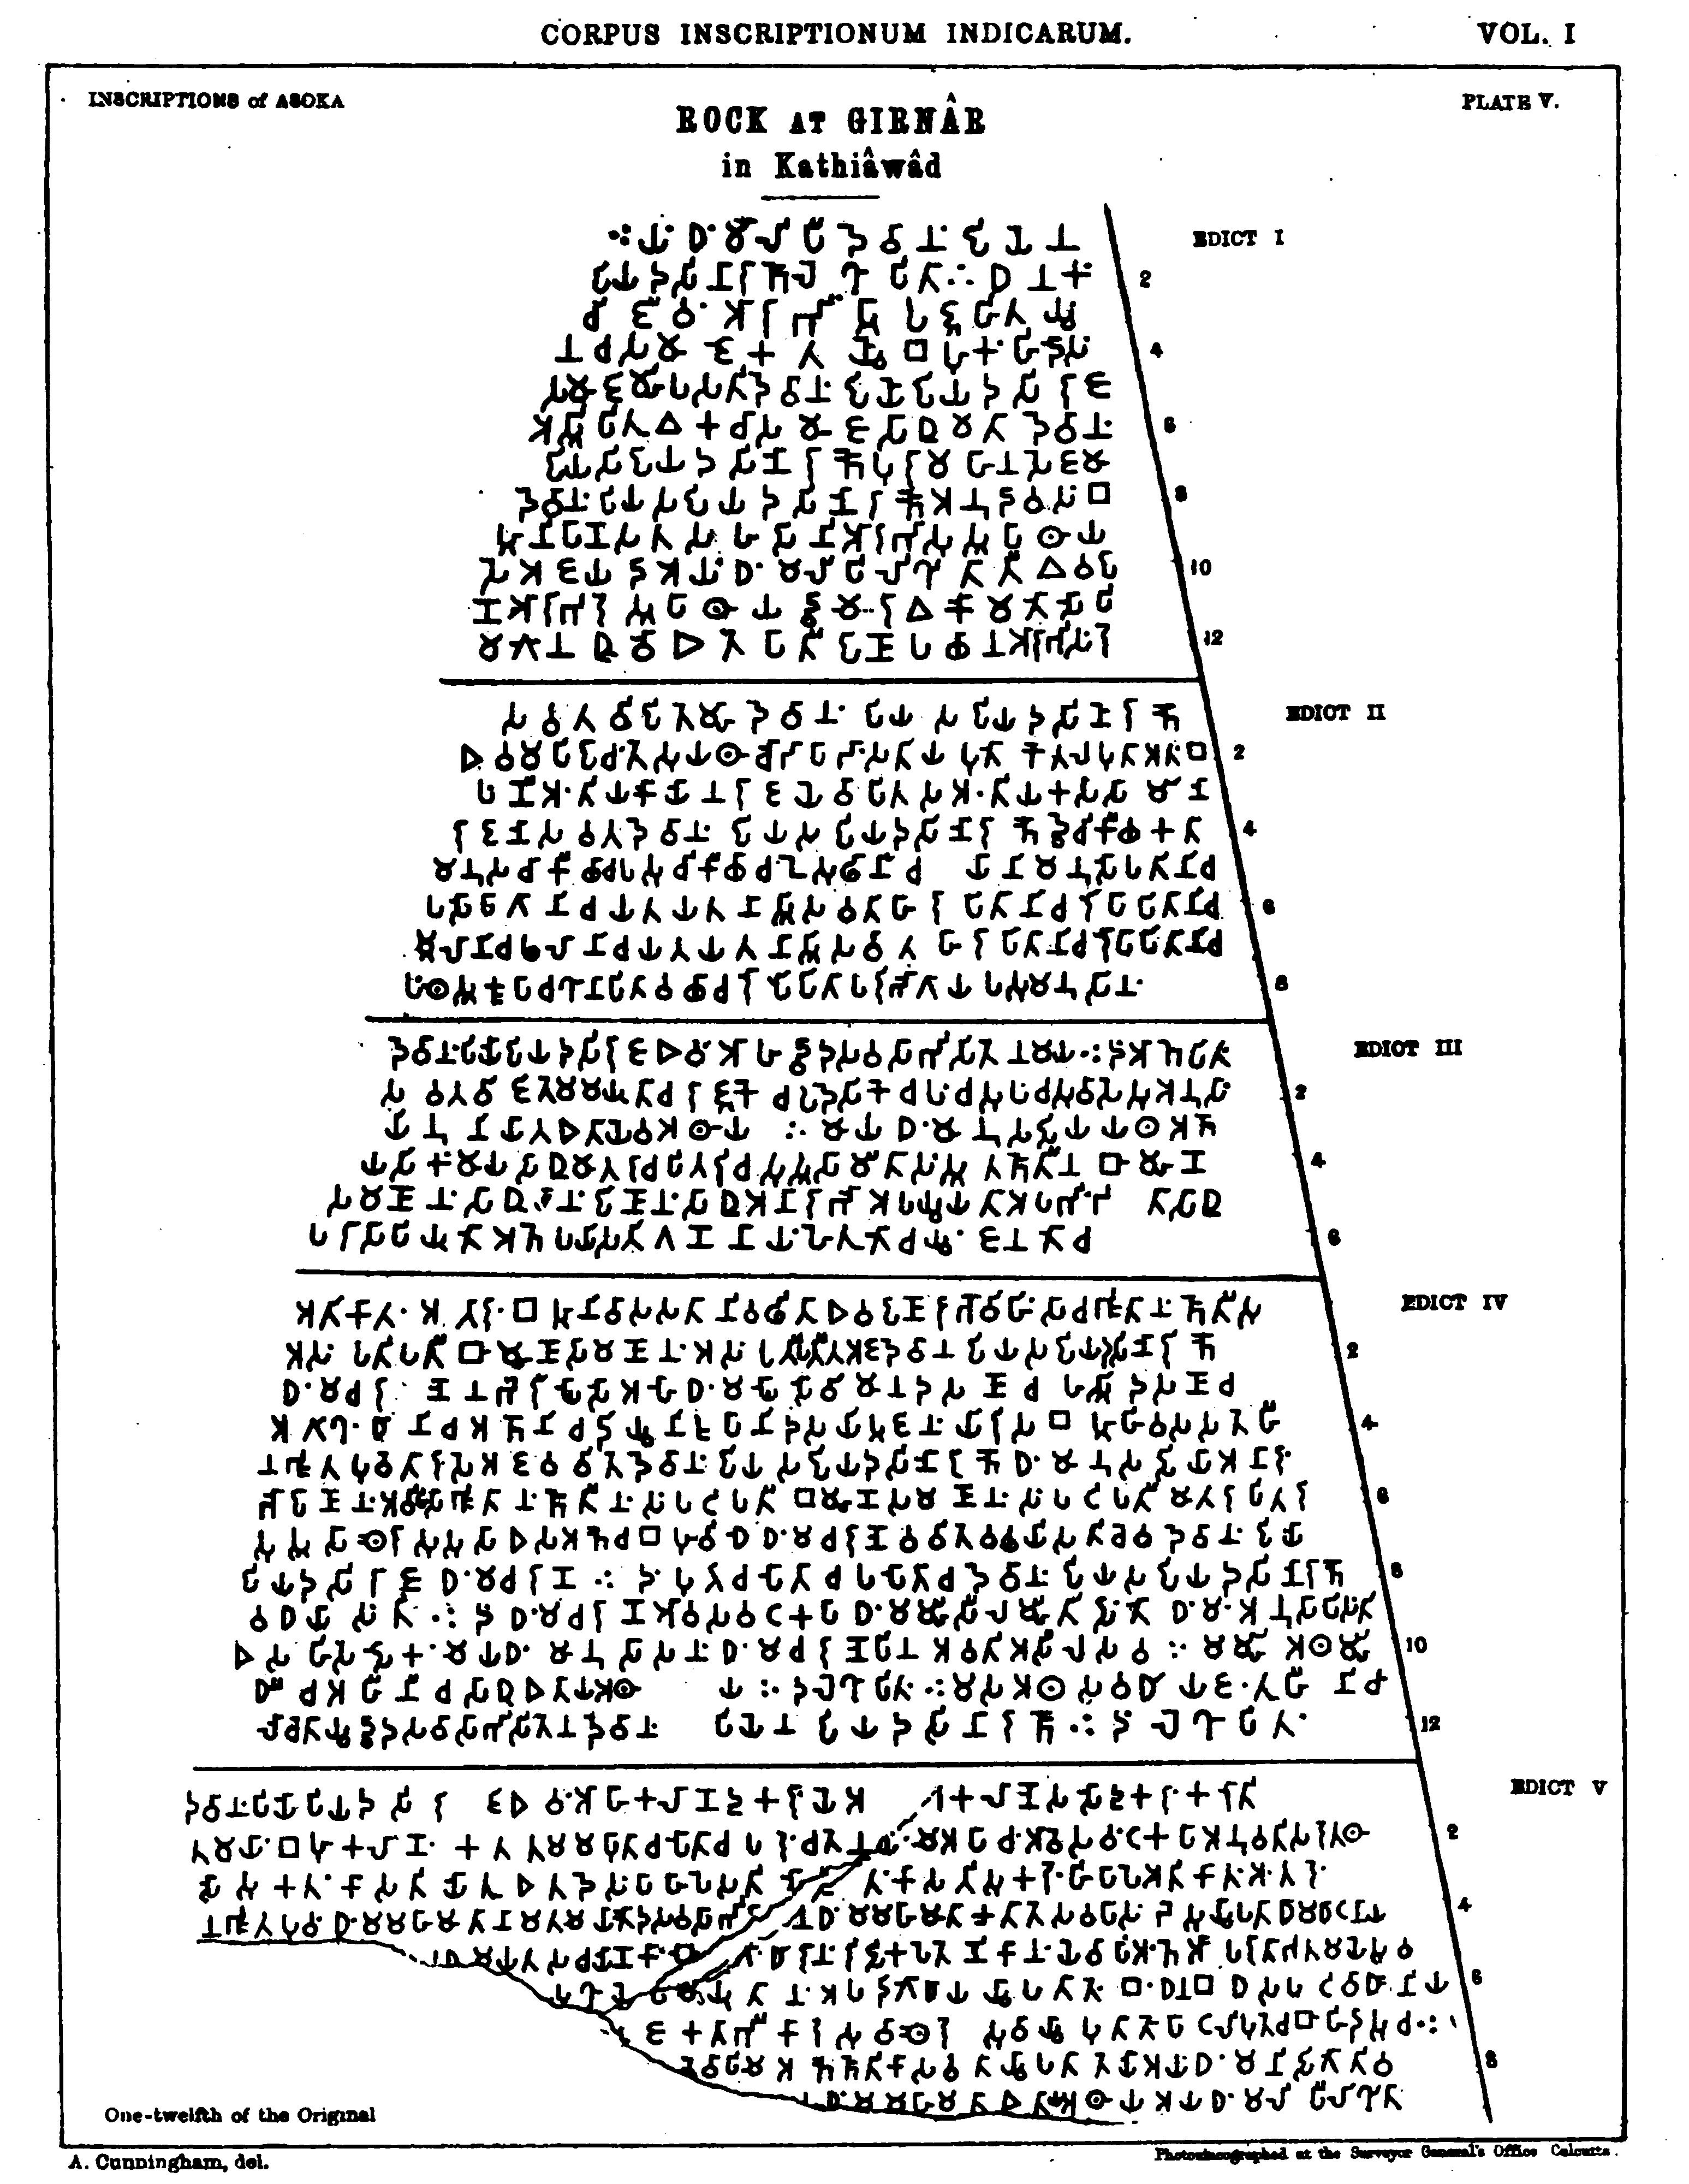 edicts of ashoka Edicts of ashoka 0 references commons category edicts of ashoka 1 reference imported from wikimedia project german wikipedia topic's main category.